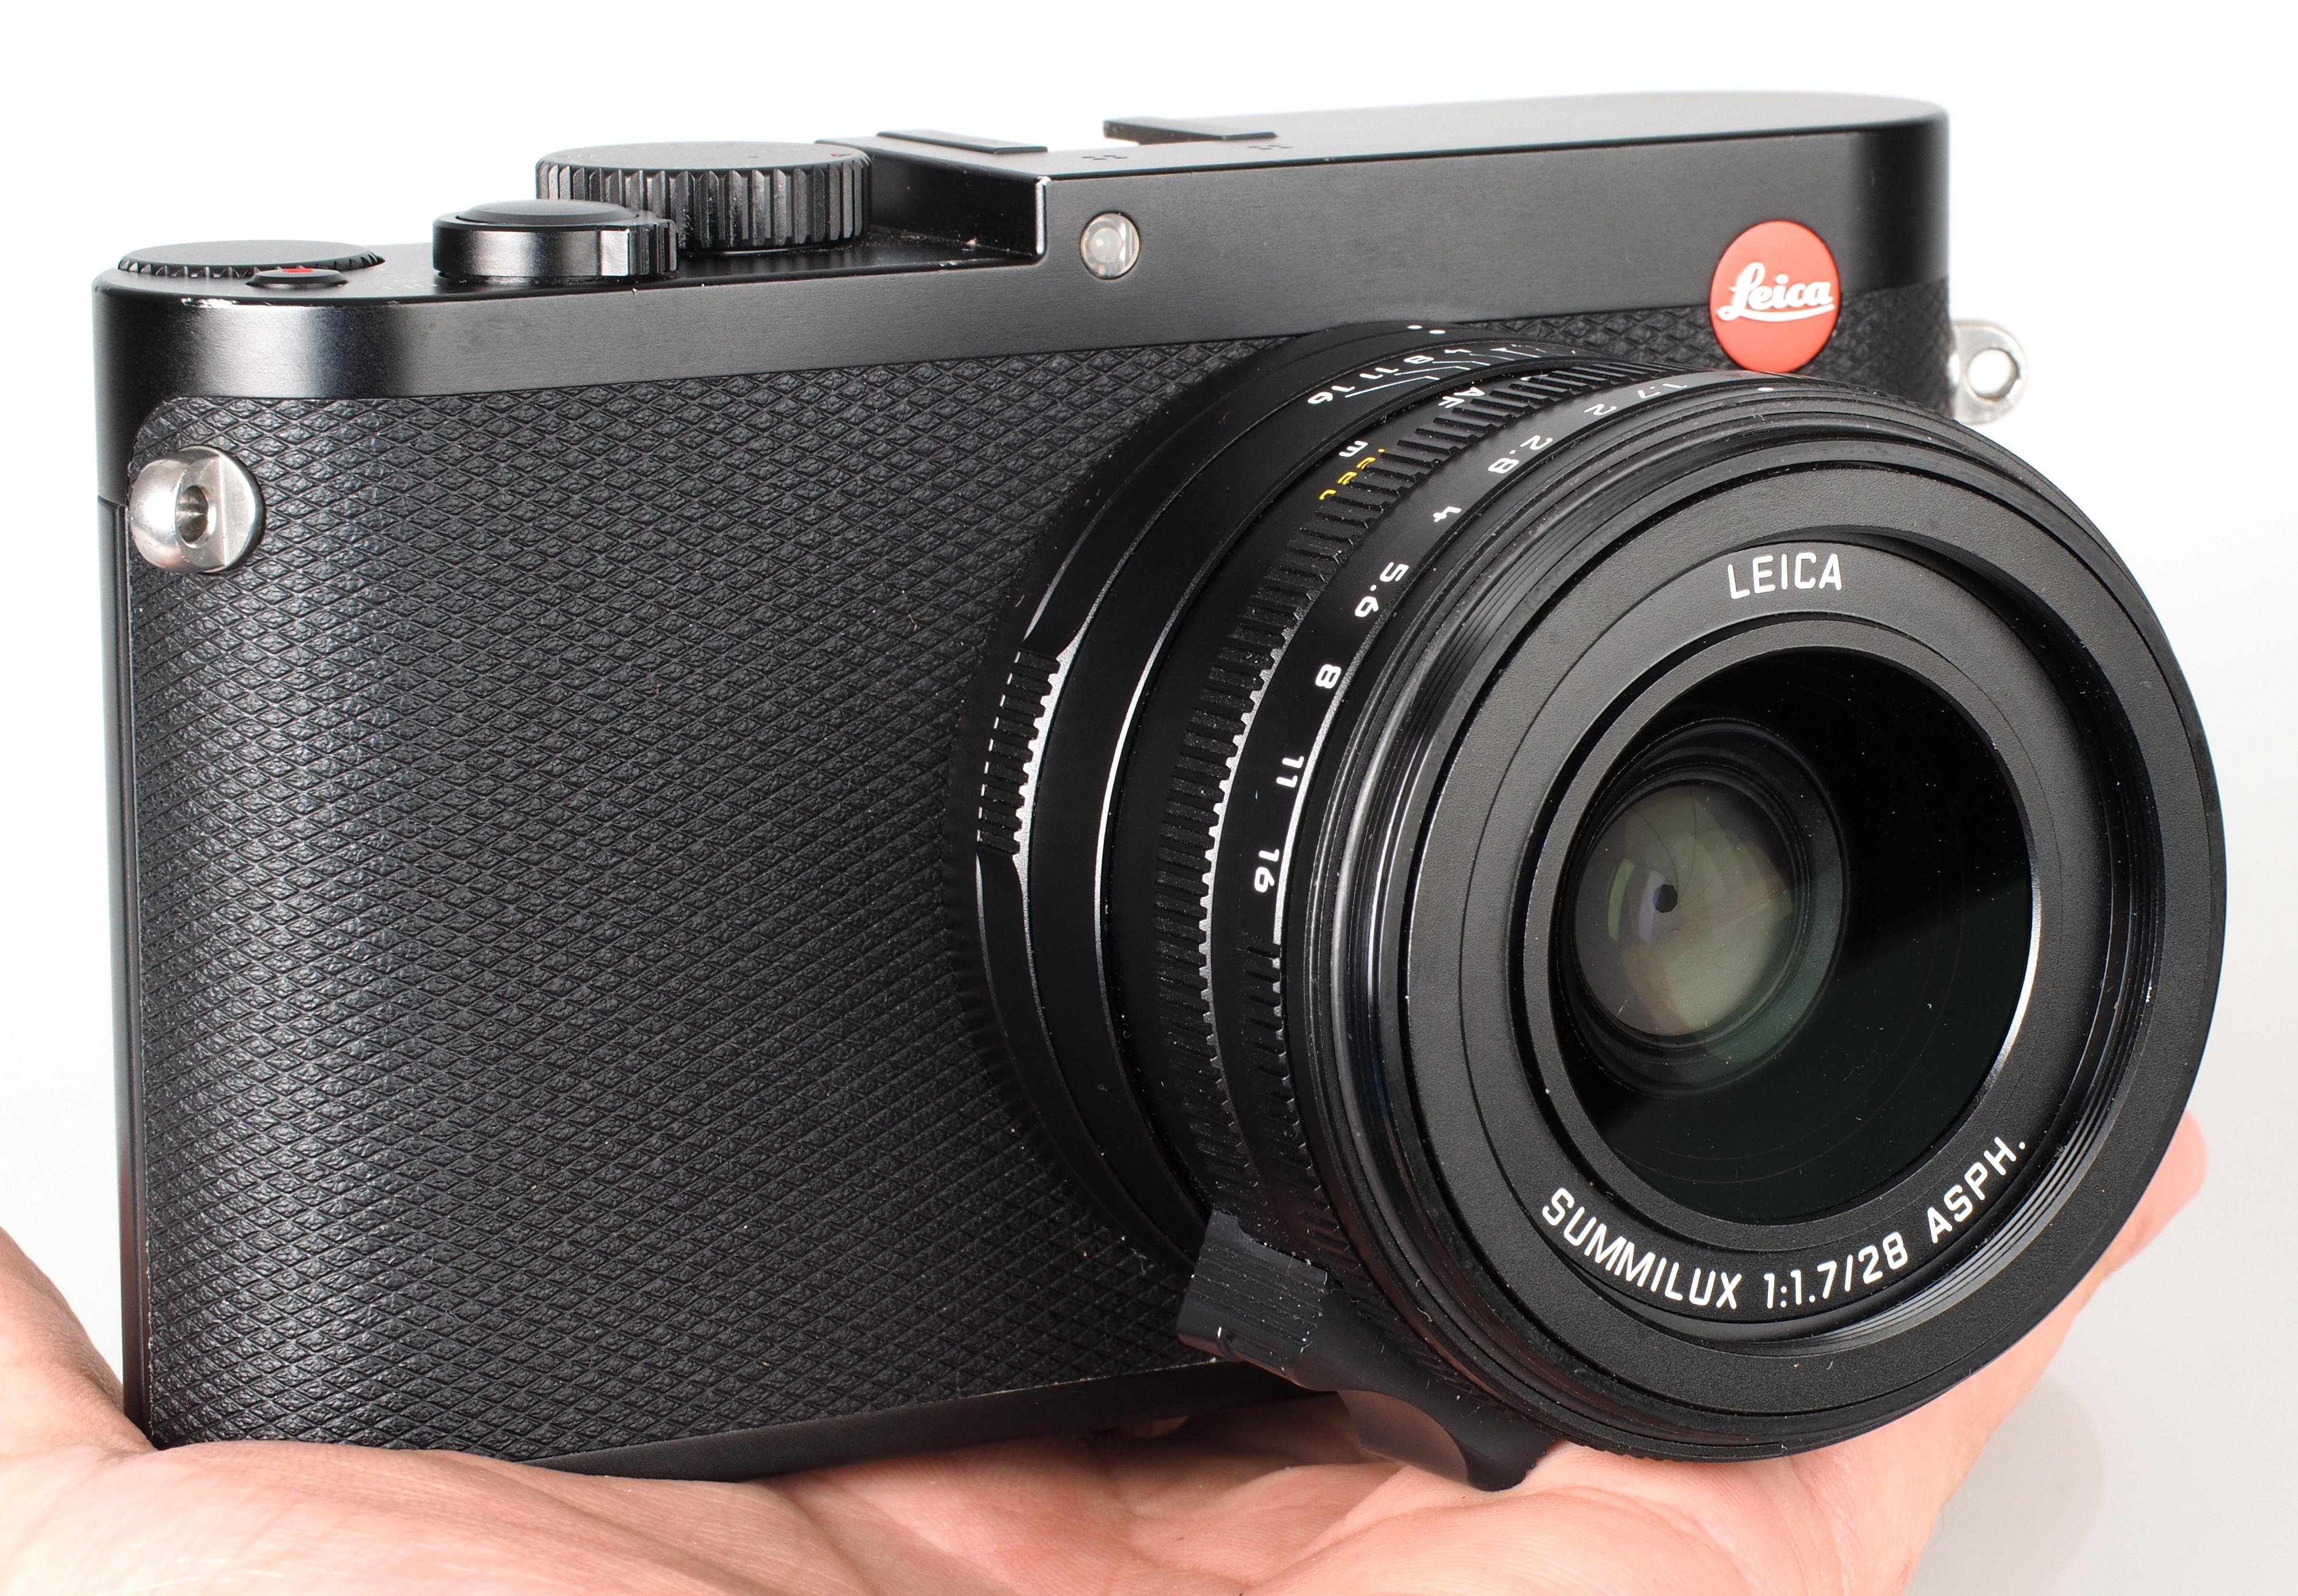 The Best SLR Cameras Under $700